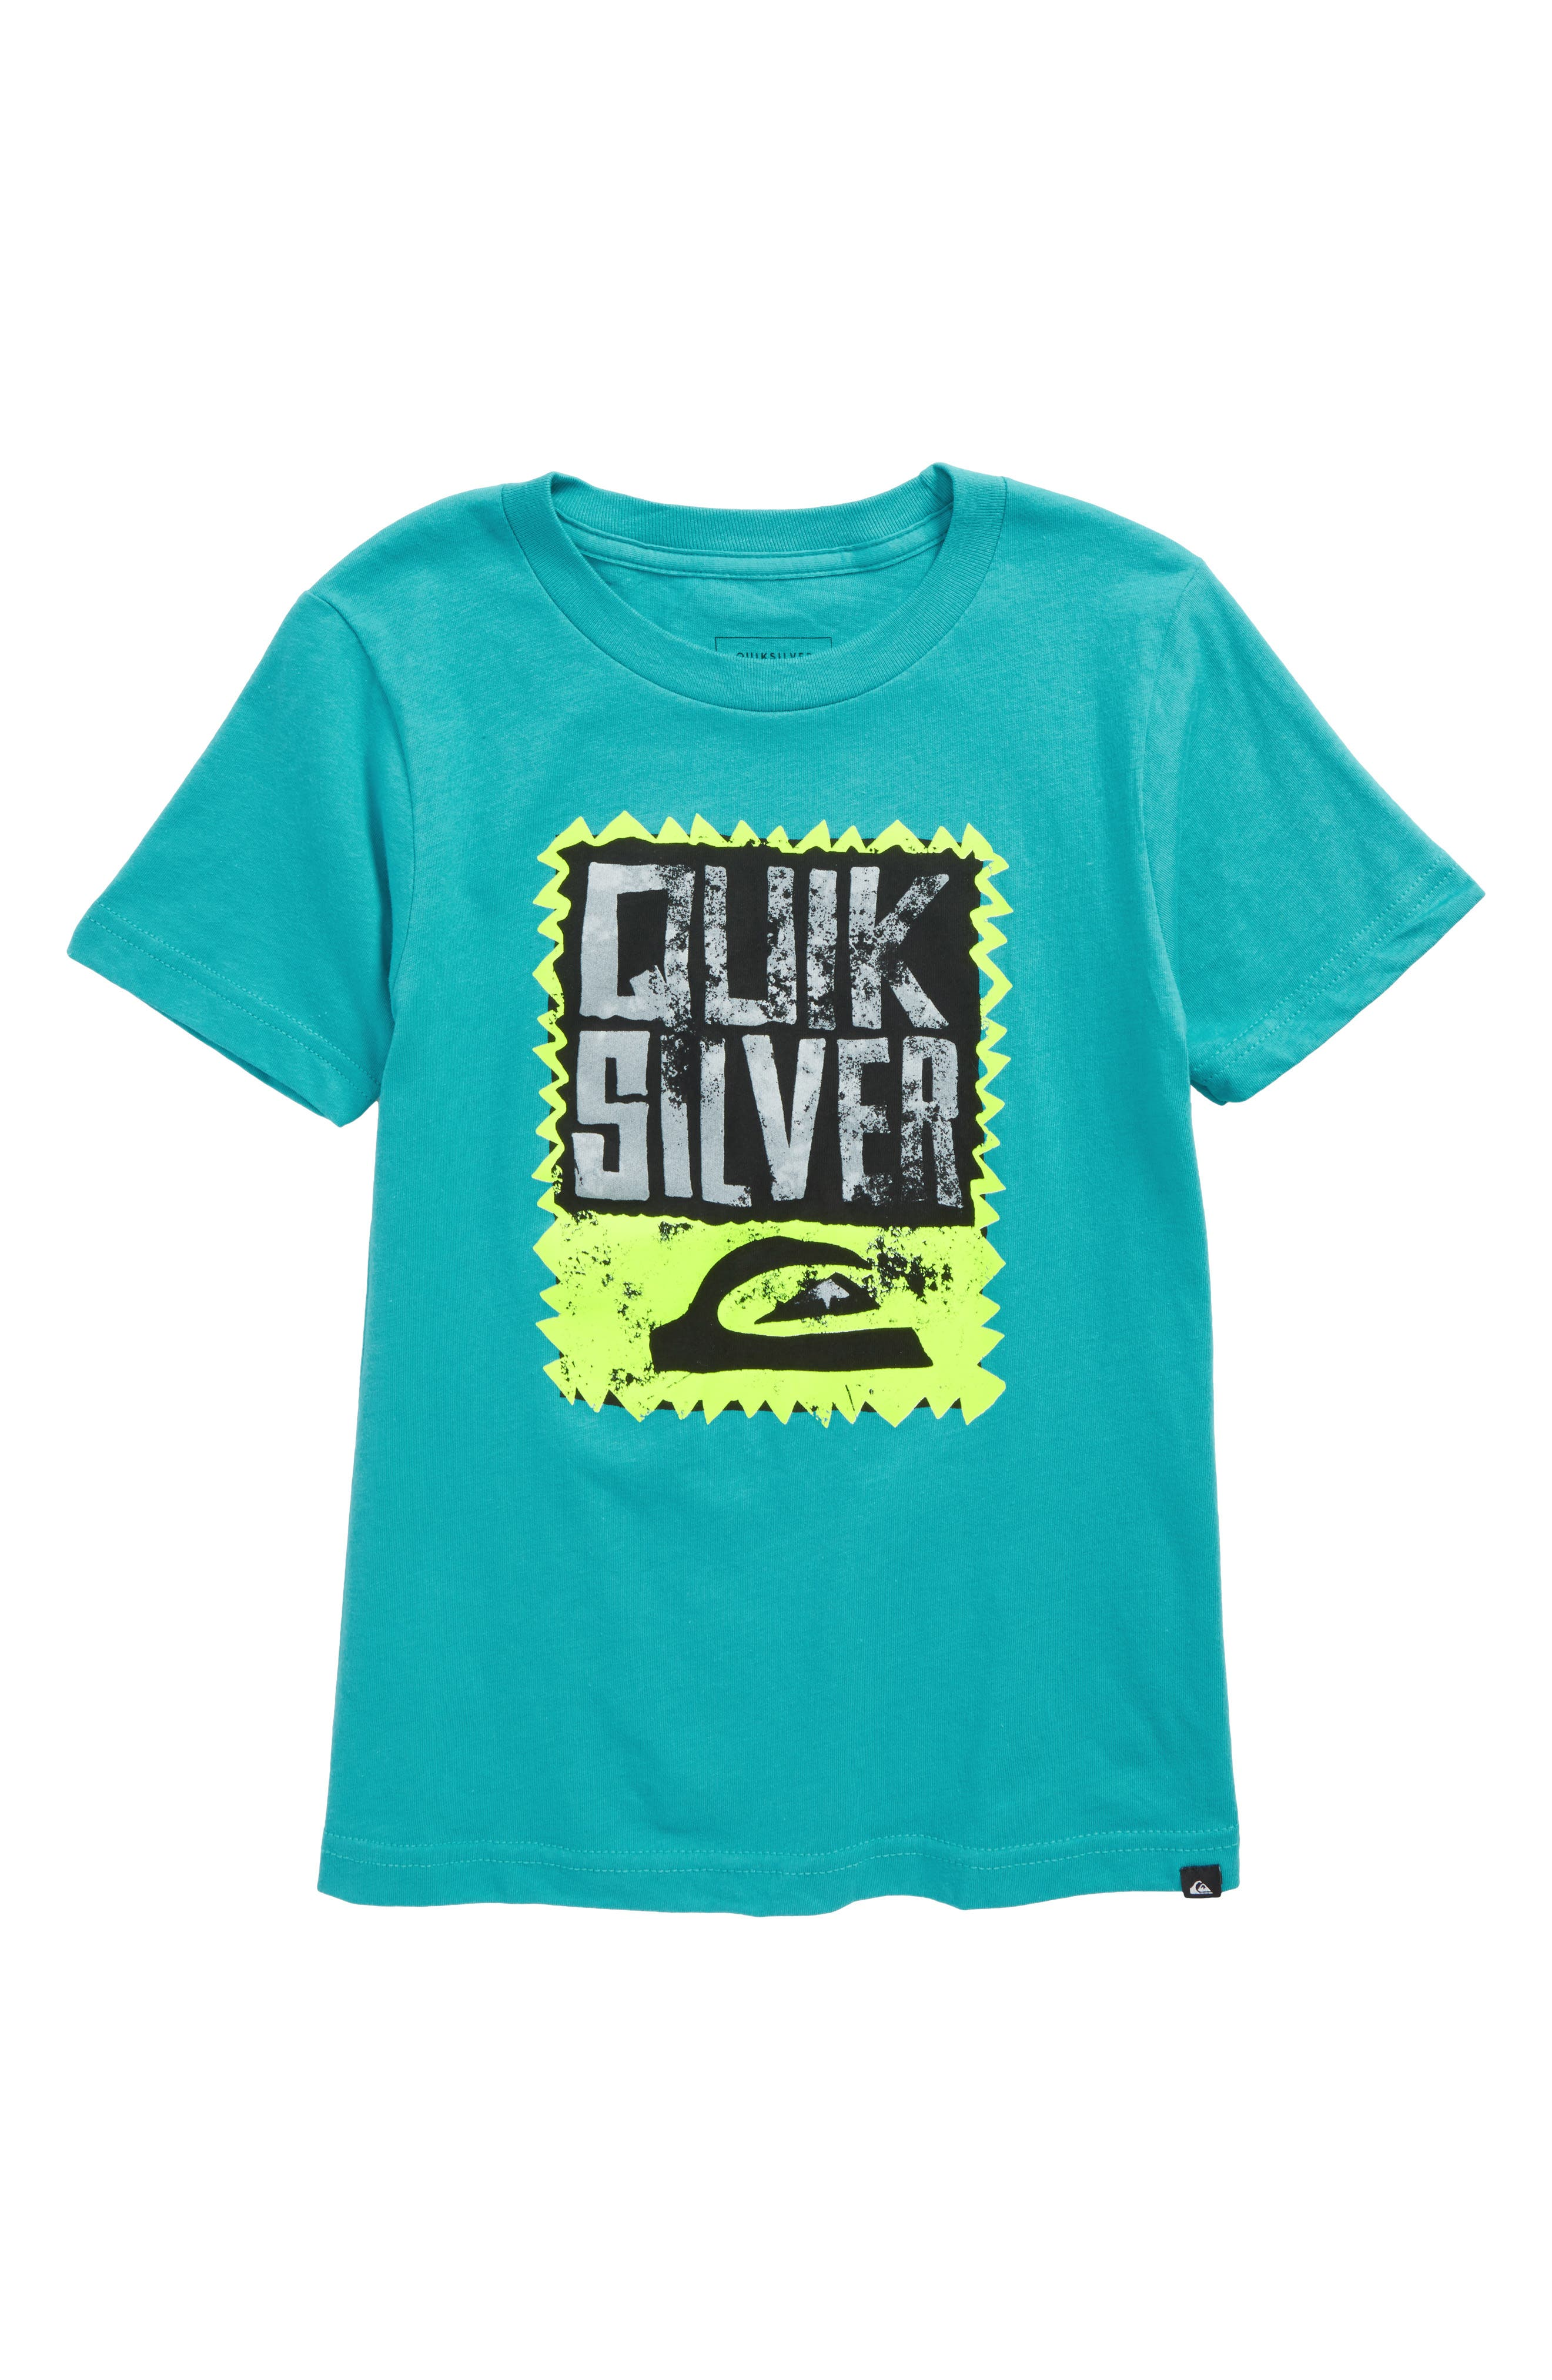 Quiksilver Awaken The Vibe Graphic T-Shirt (Toddler Boys & Little Boys)